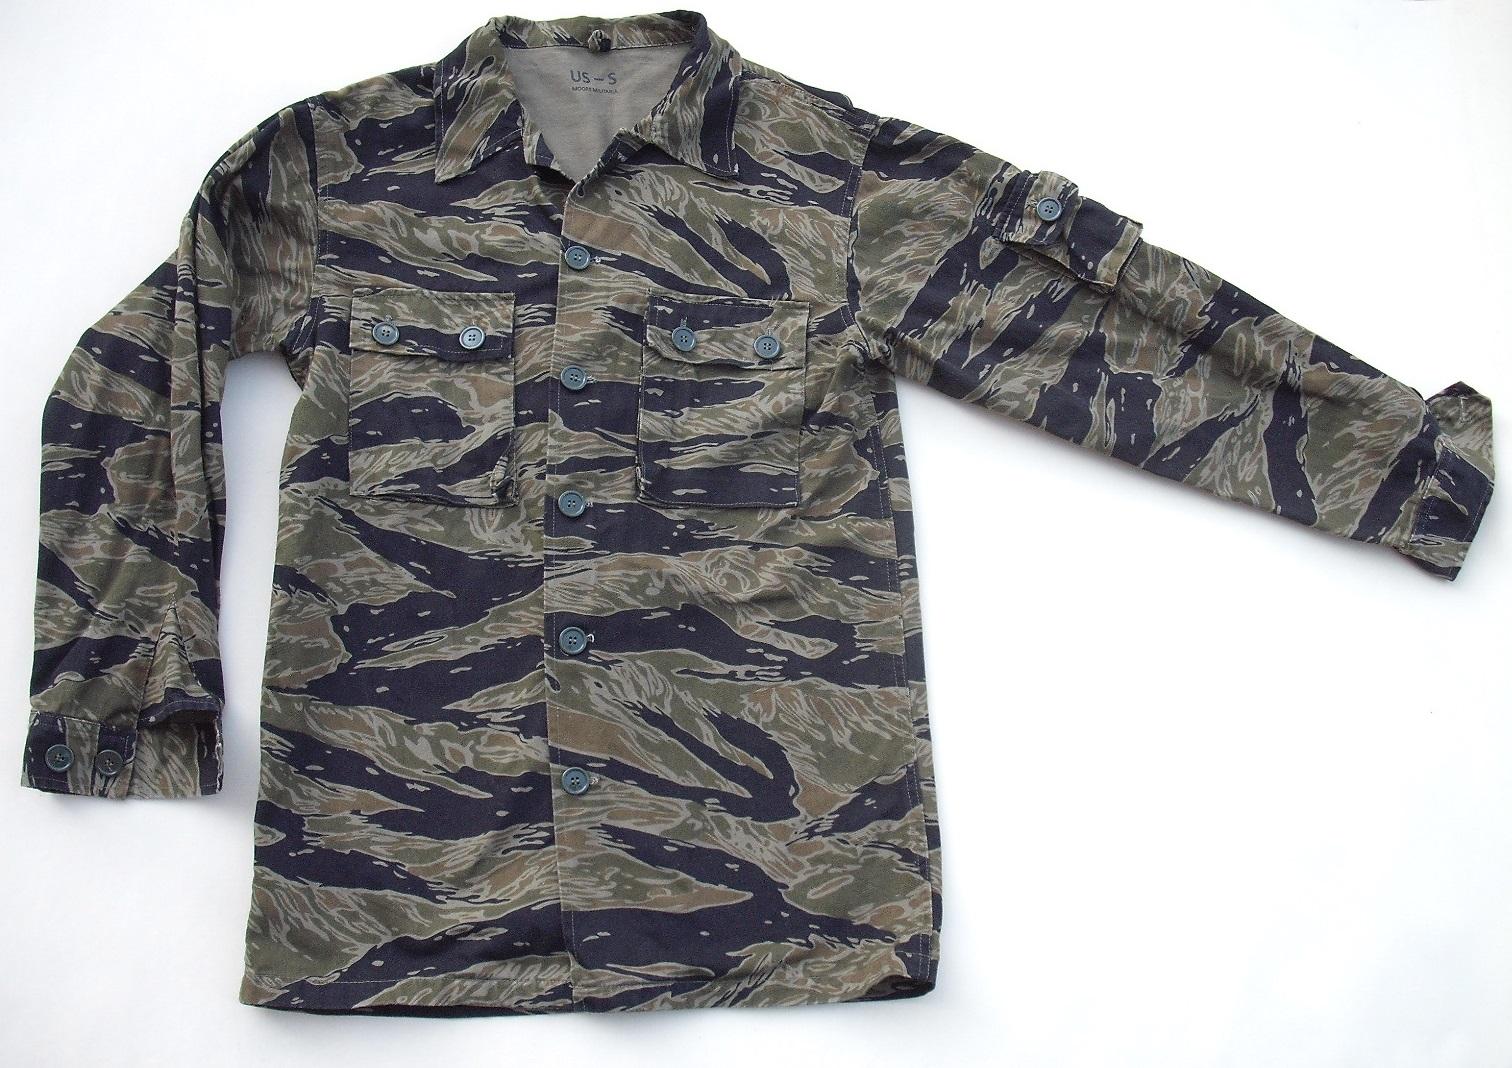 Mundur bluza spodnie Tiger Stripe Tadpole MOORE S